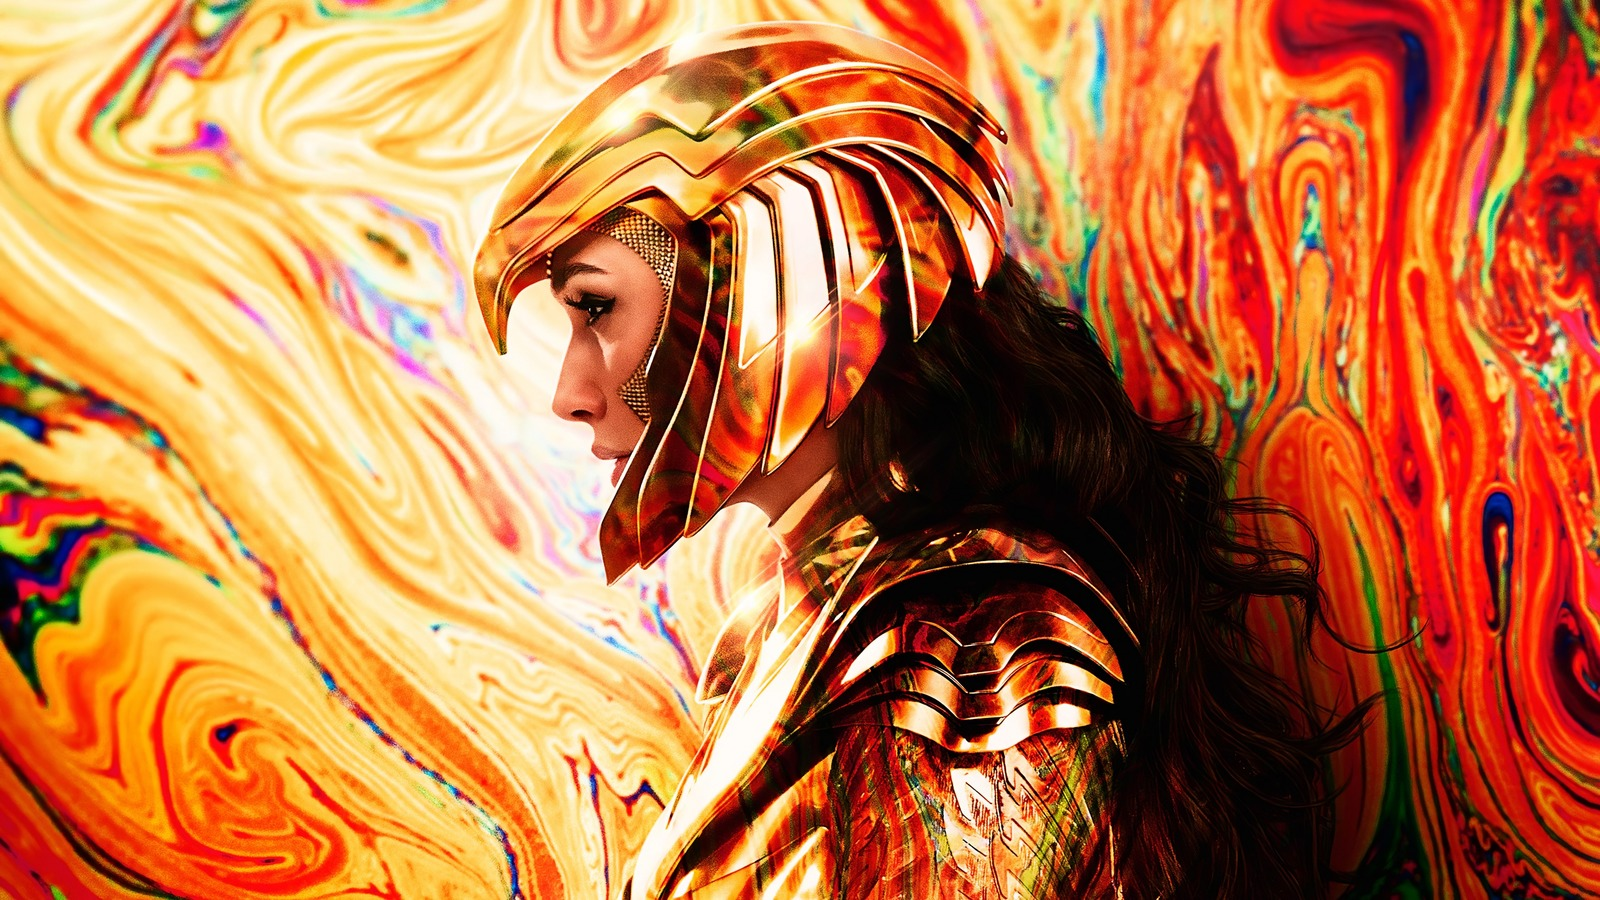 Wonder Woman 1984 new character posters bring the drama